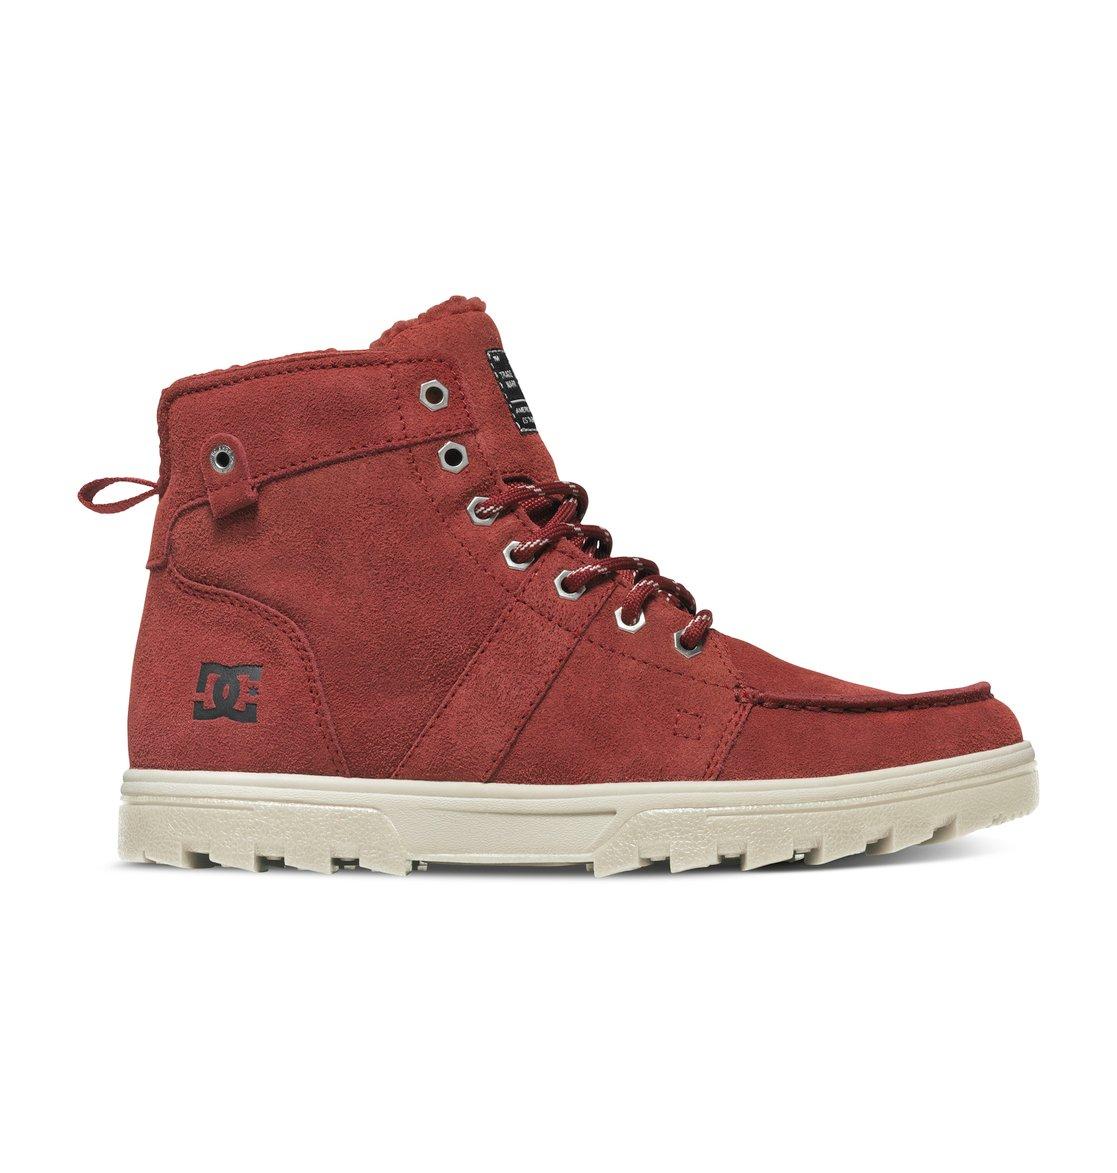 DC-Shoes-Woodland-Zapatillas-altas-de-exterior-hombre-303241